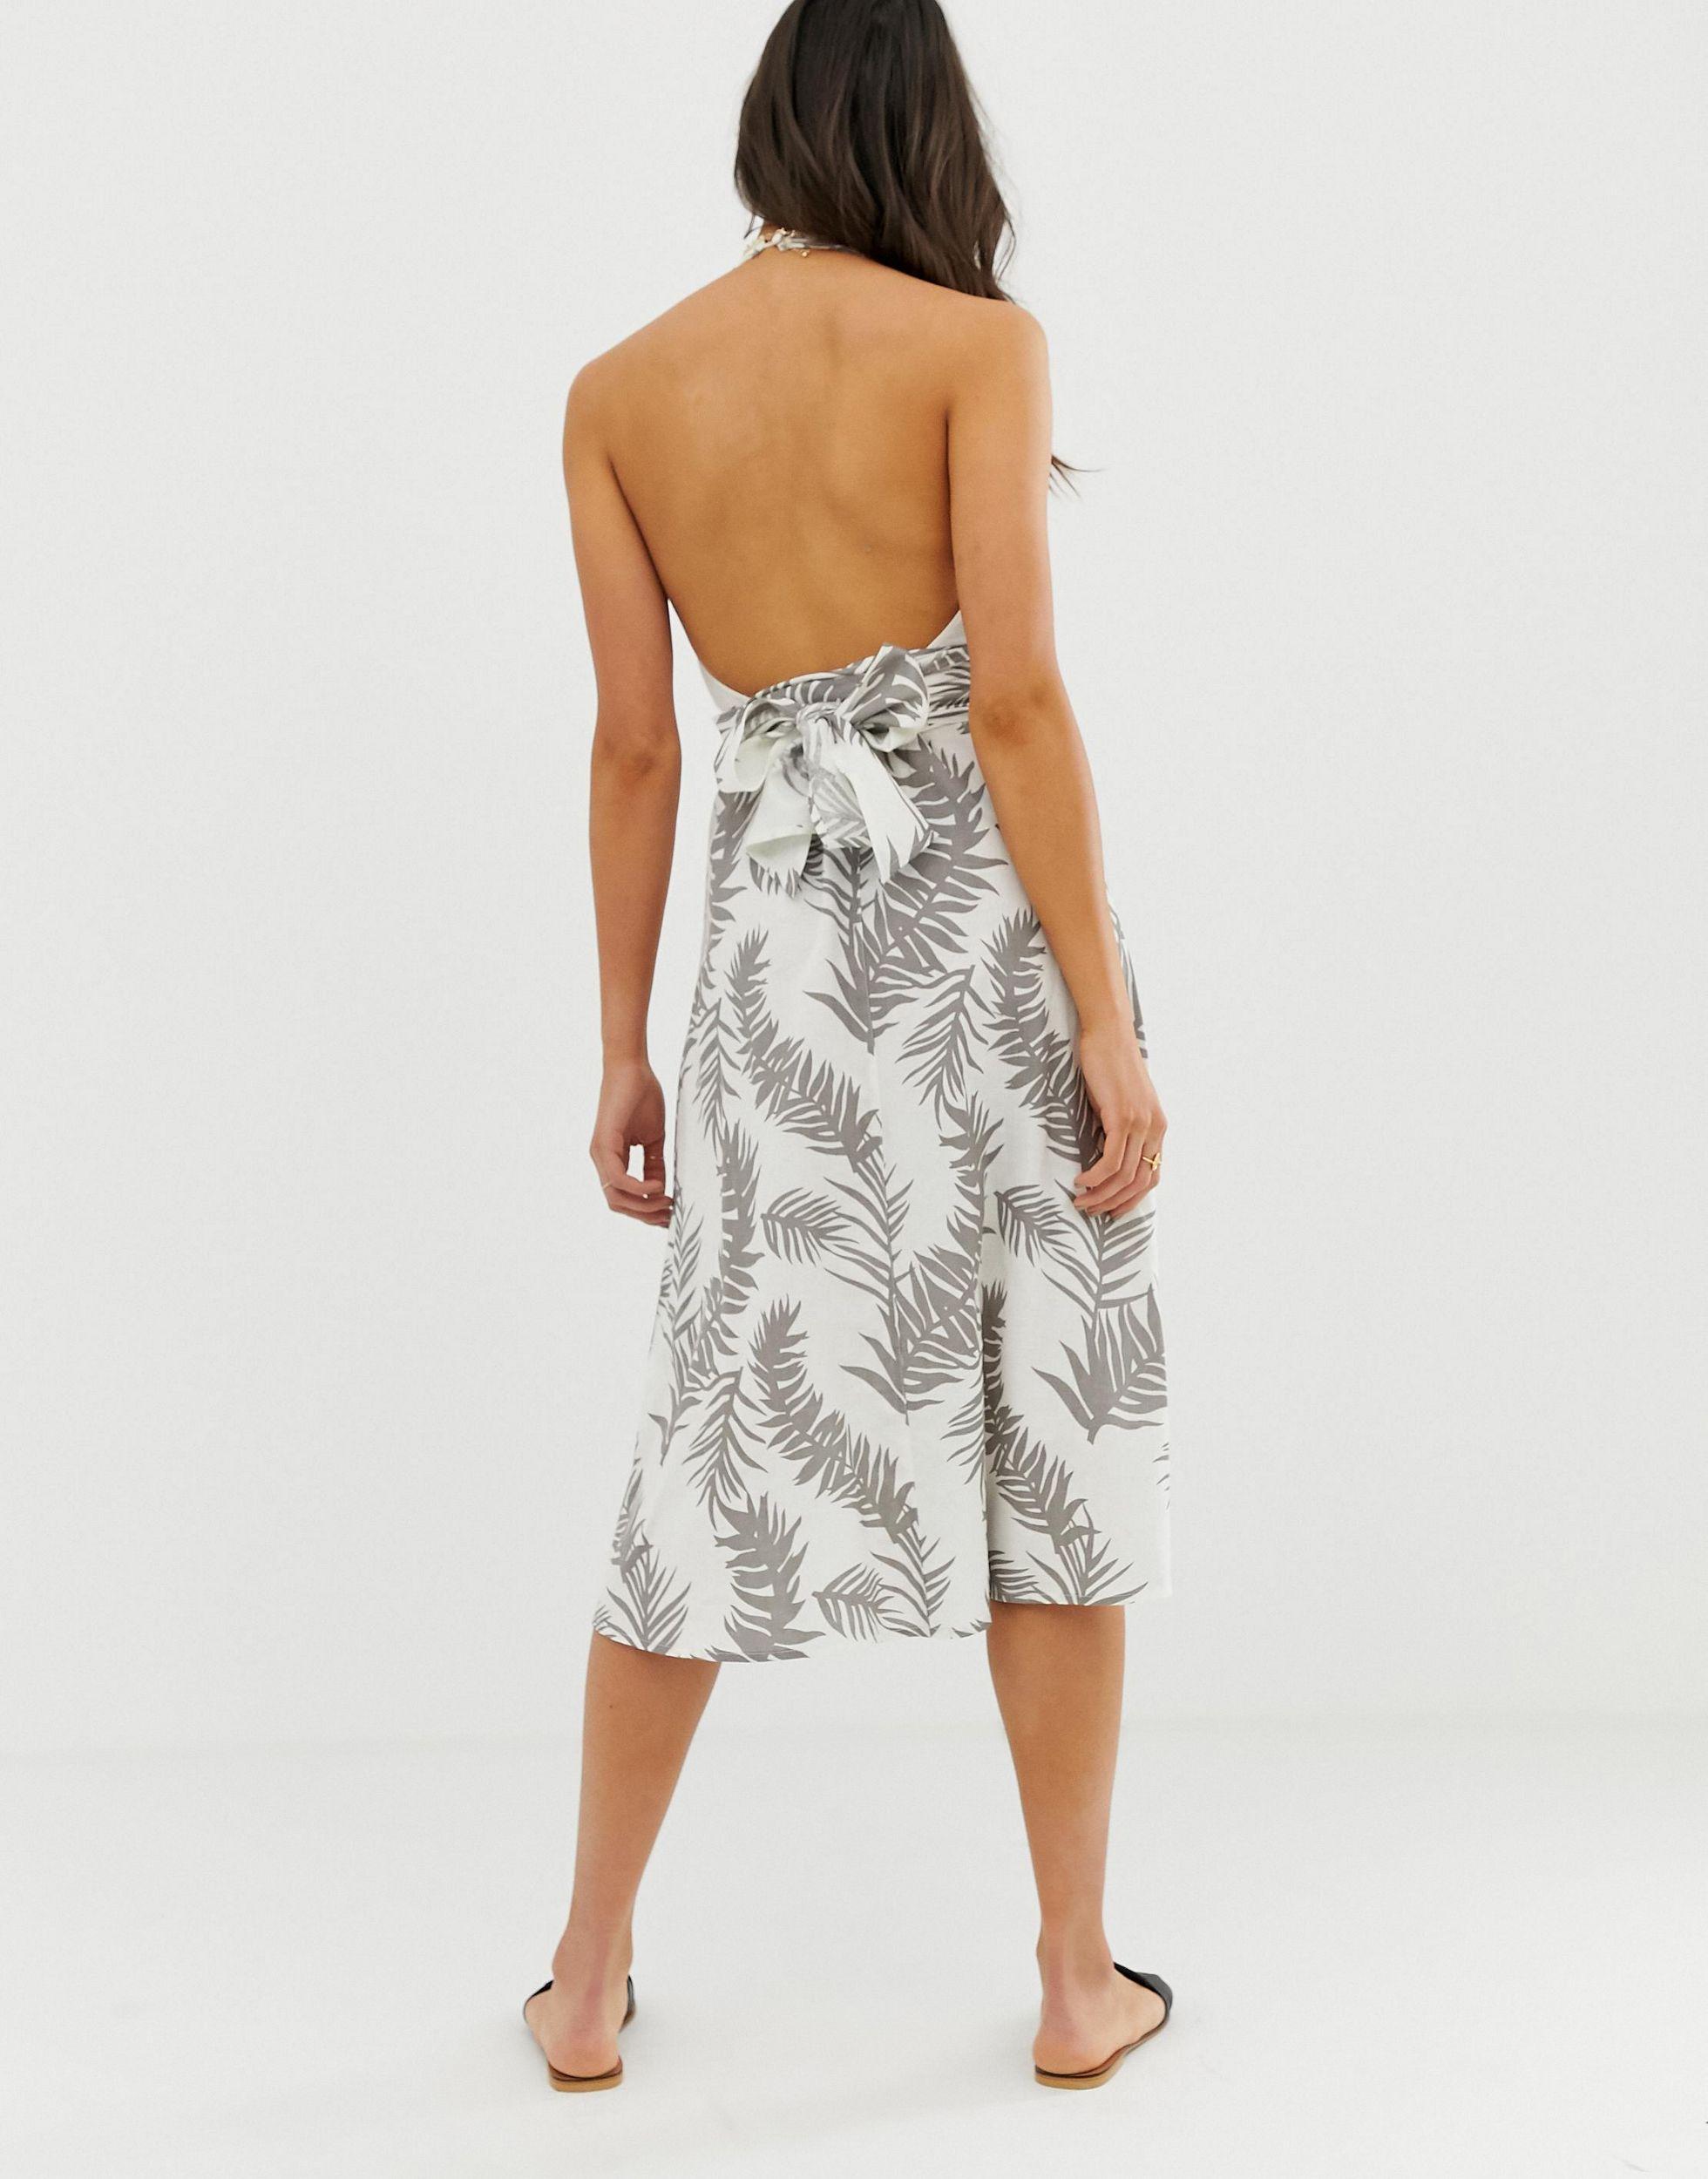 ASOS DESIGN Tall - Robe d'été cache-cœur dos nu mi-longue imprimé tropical en Coton ASOS